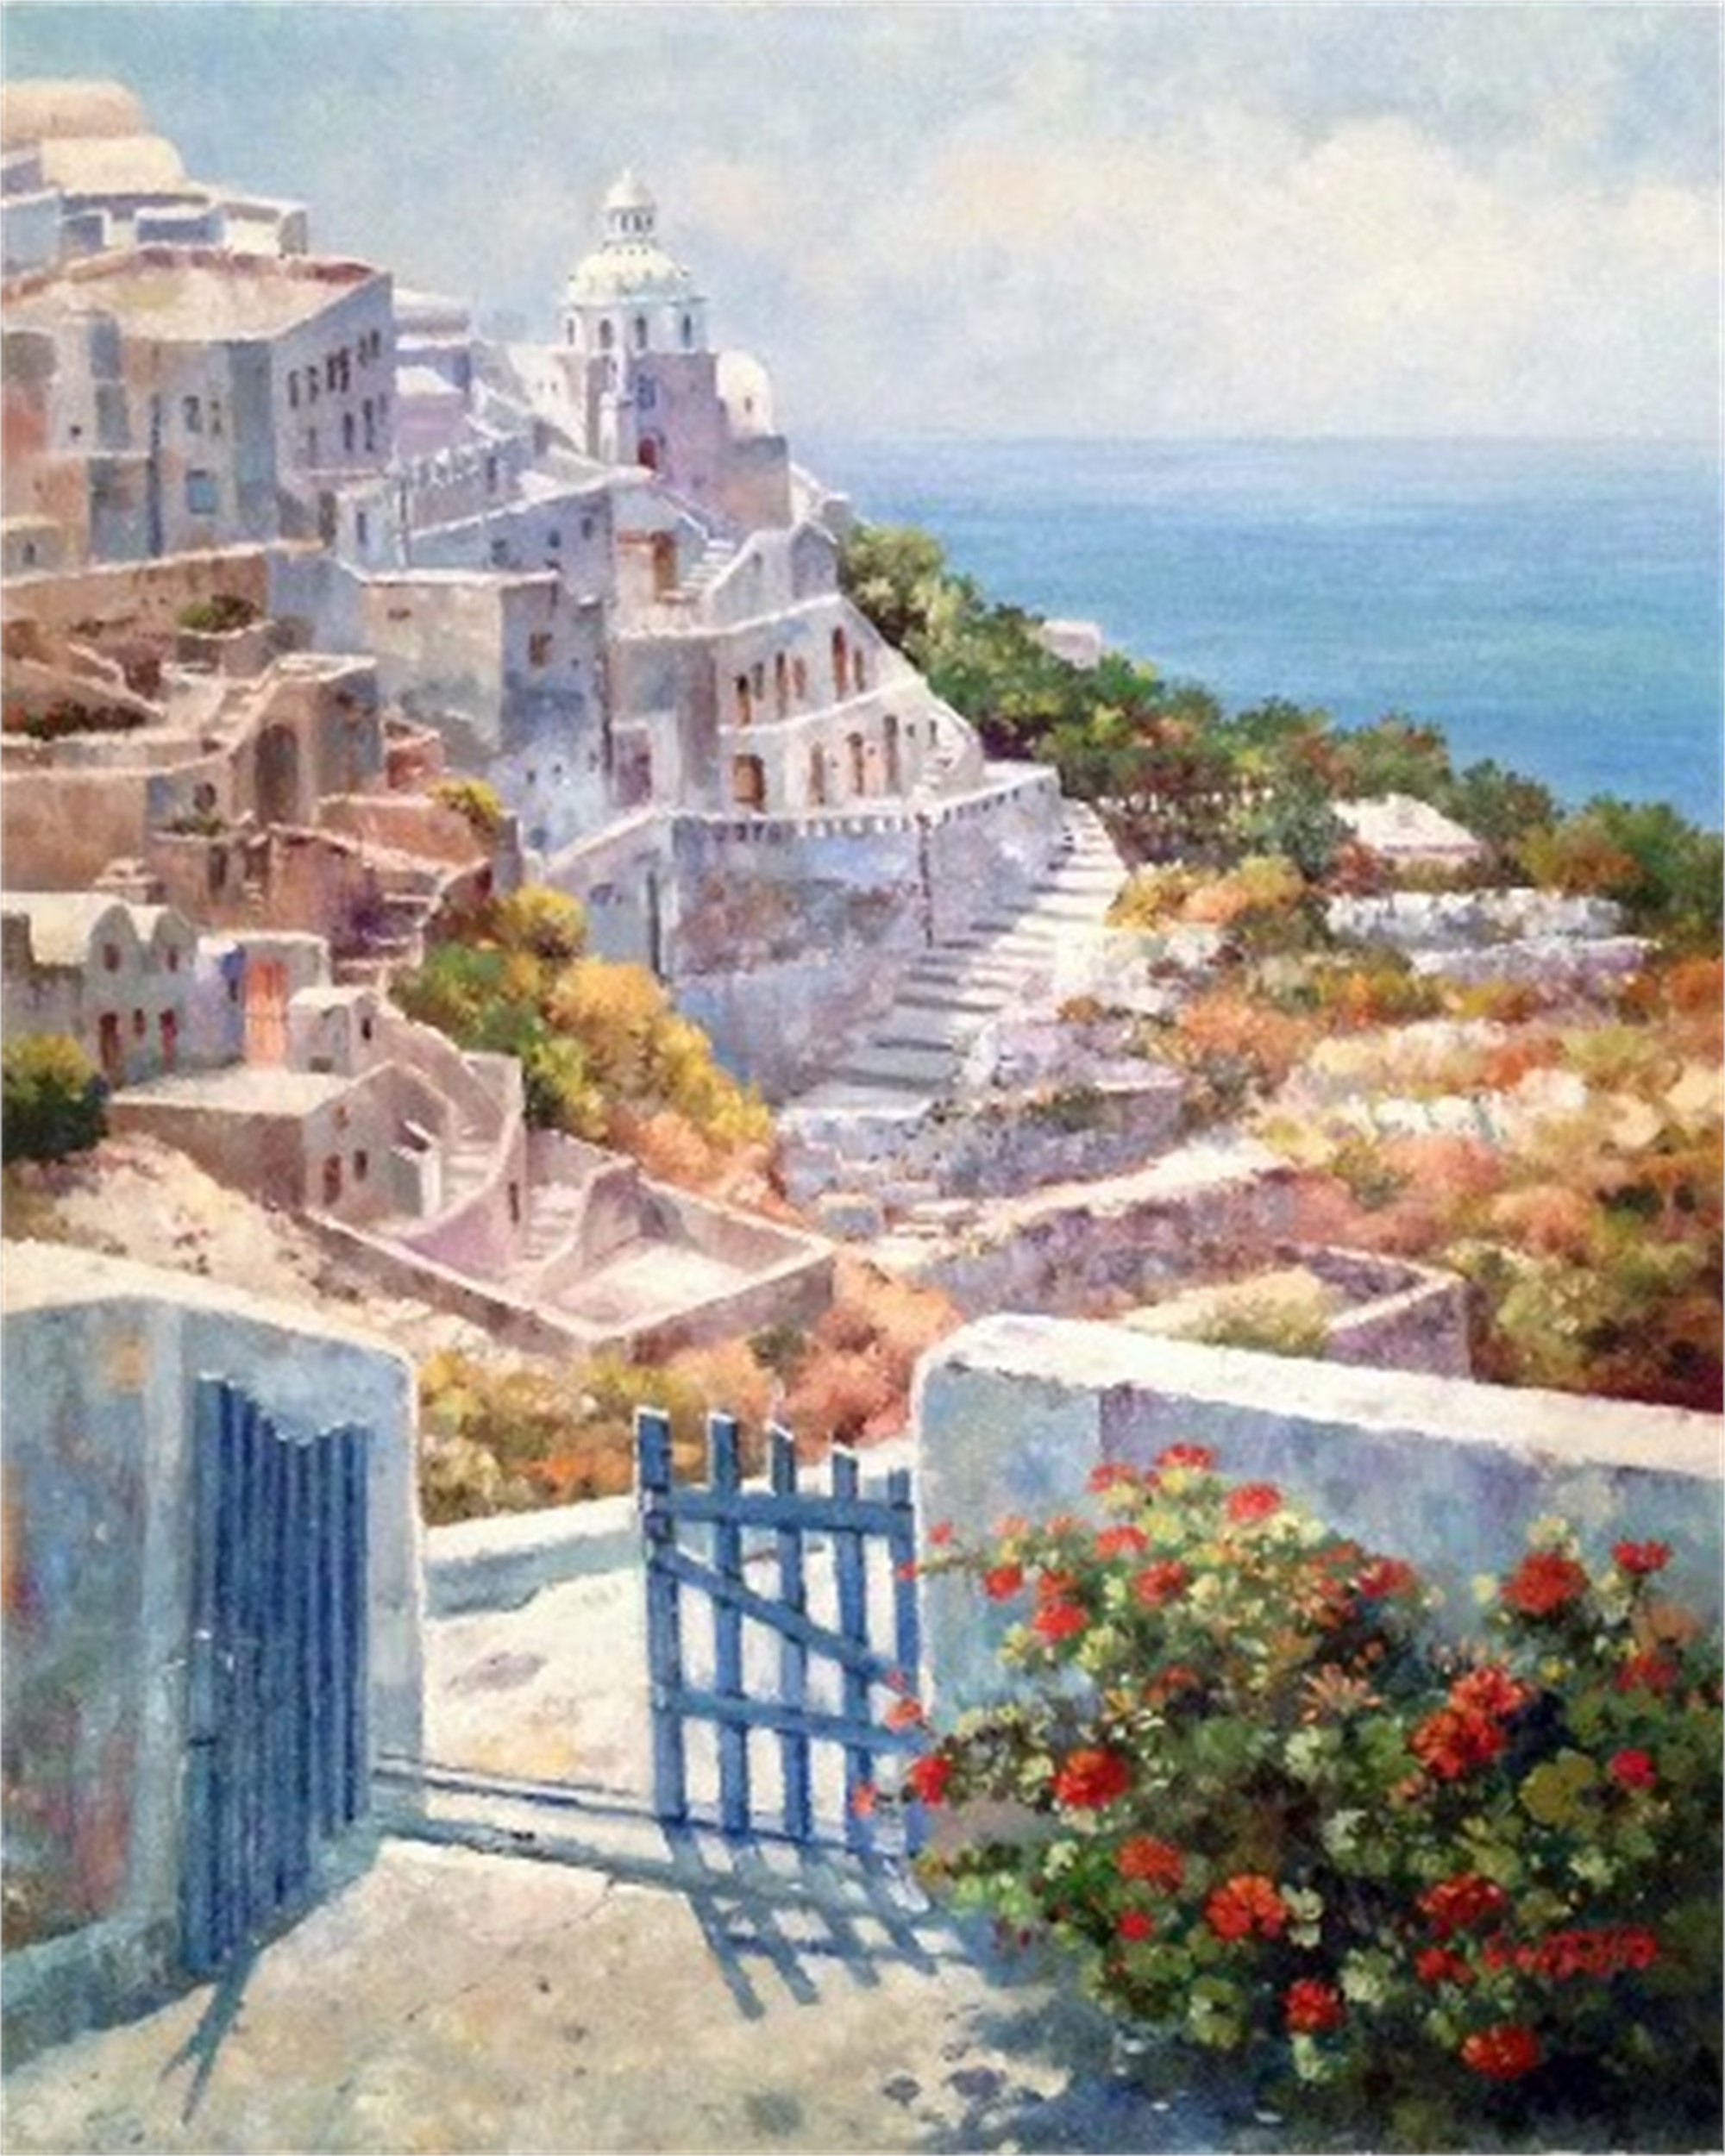 GREEK ROMANCE by GANTNER